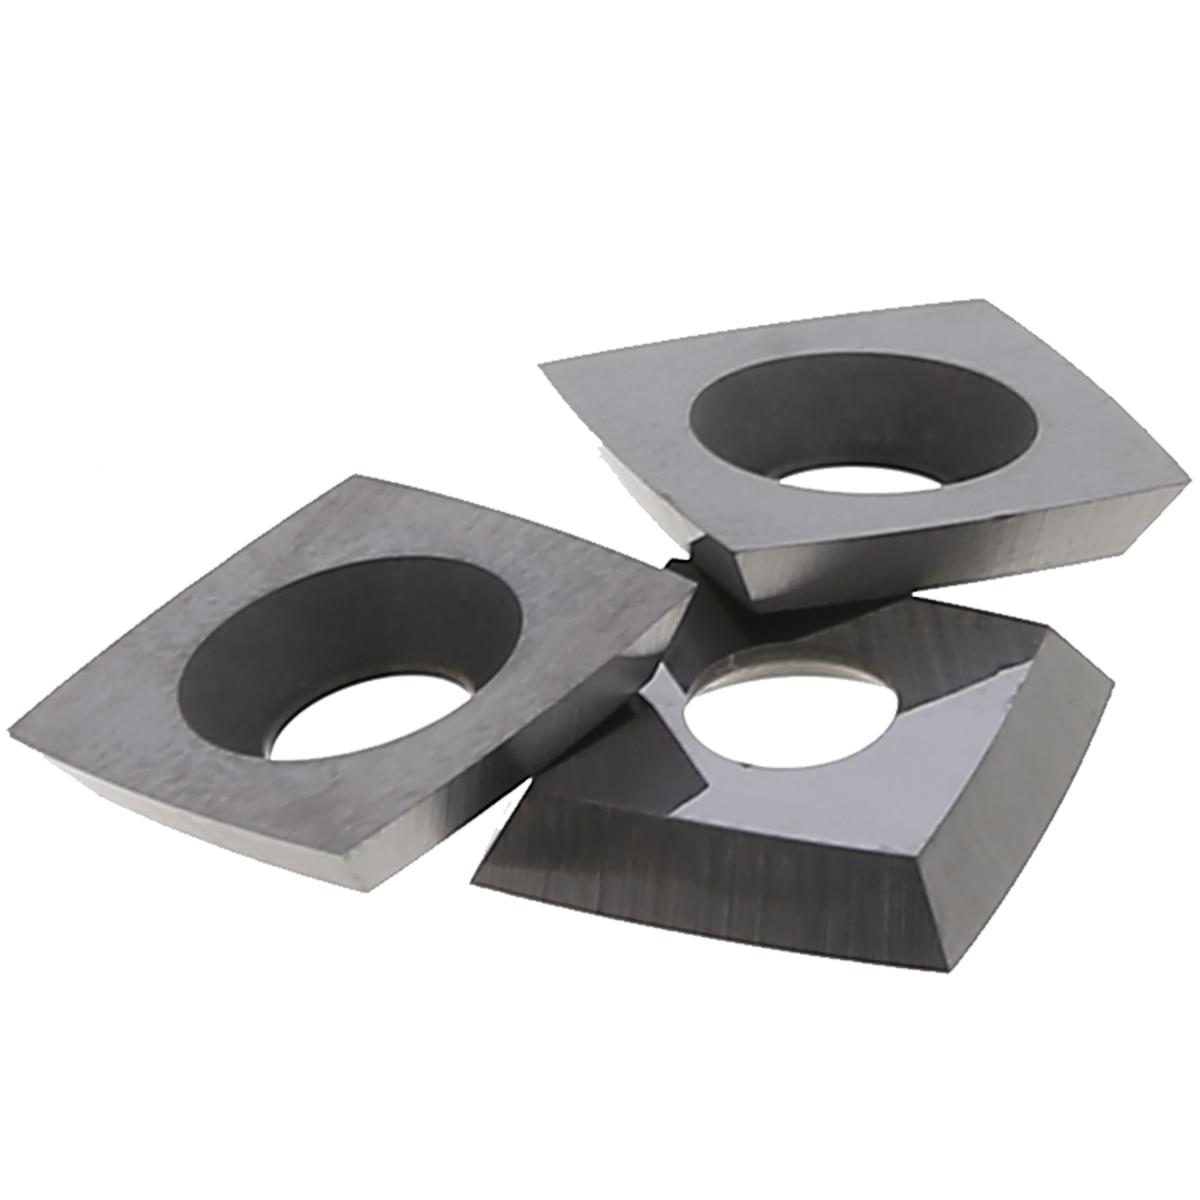 3pcs 11*11*2mm Square Carbide Insert 2